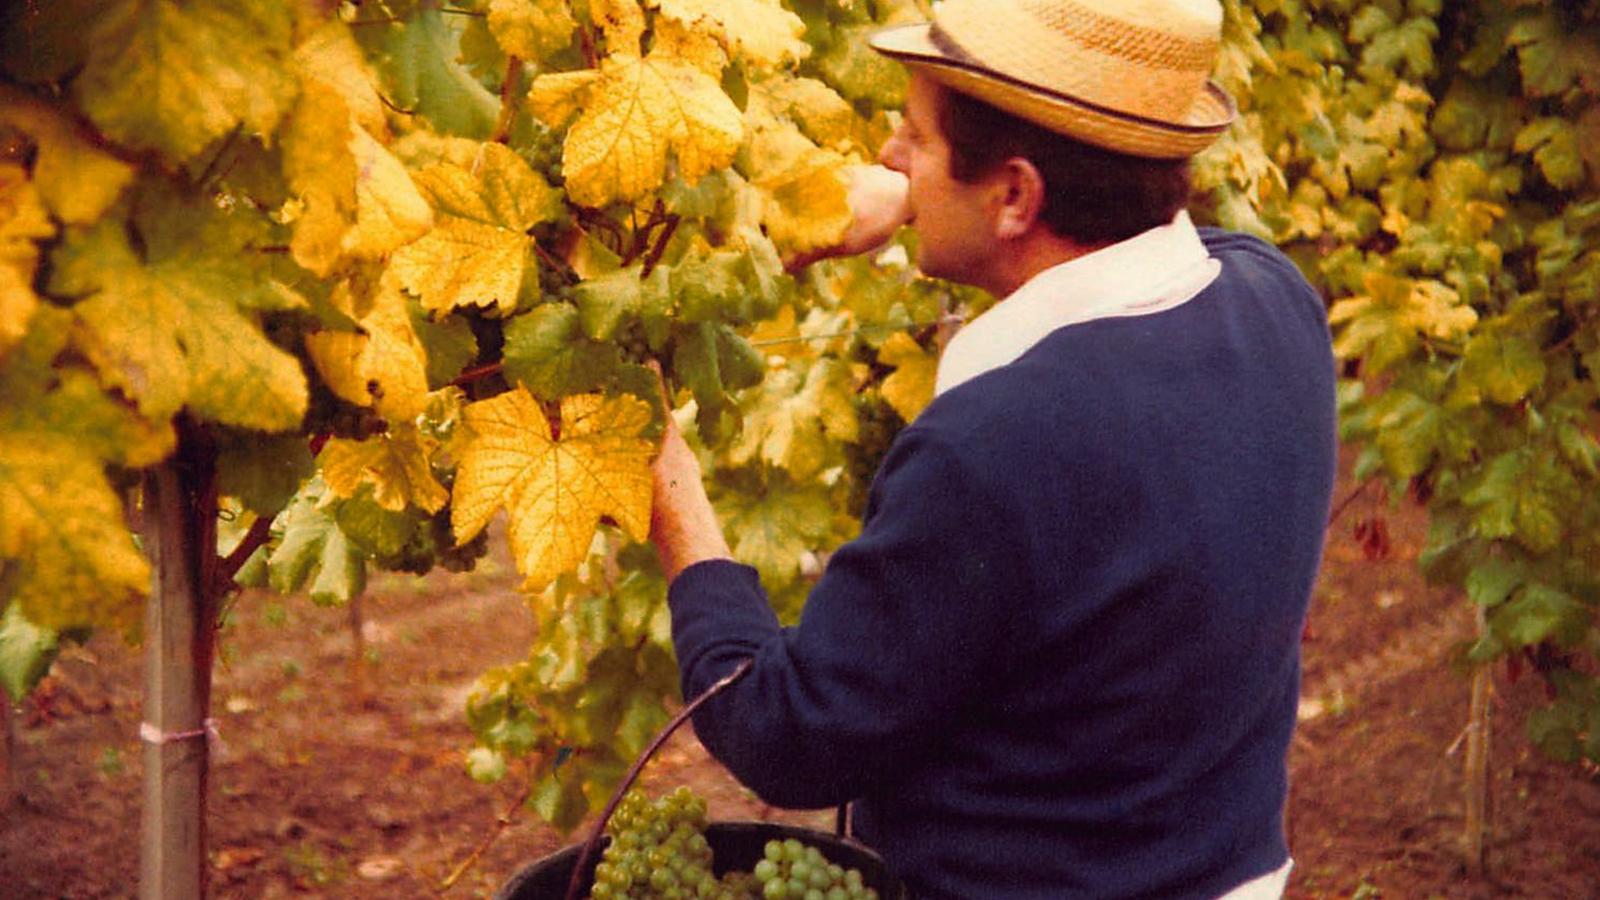 Work in the vineyard